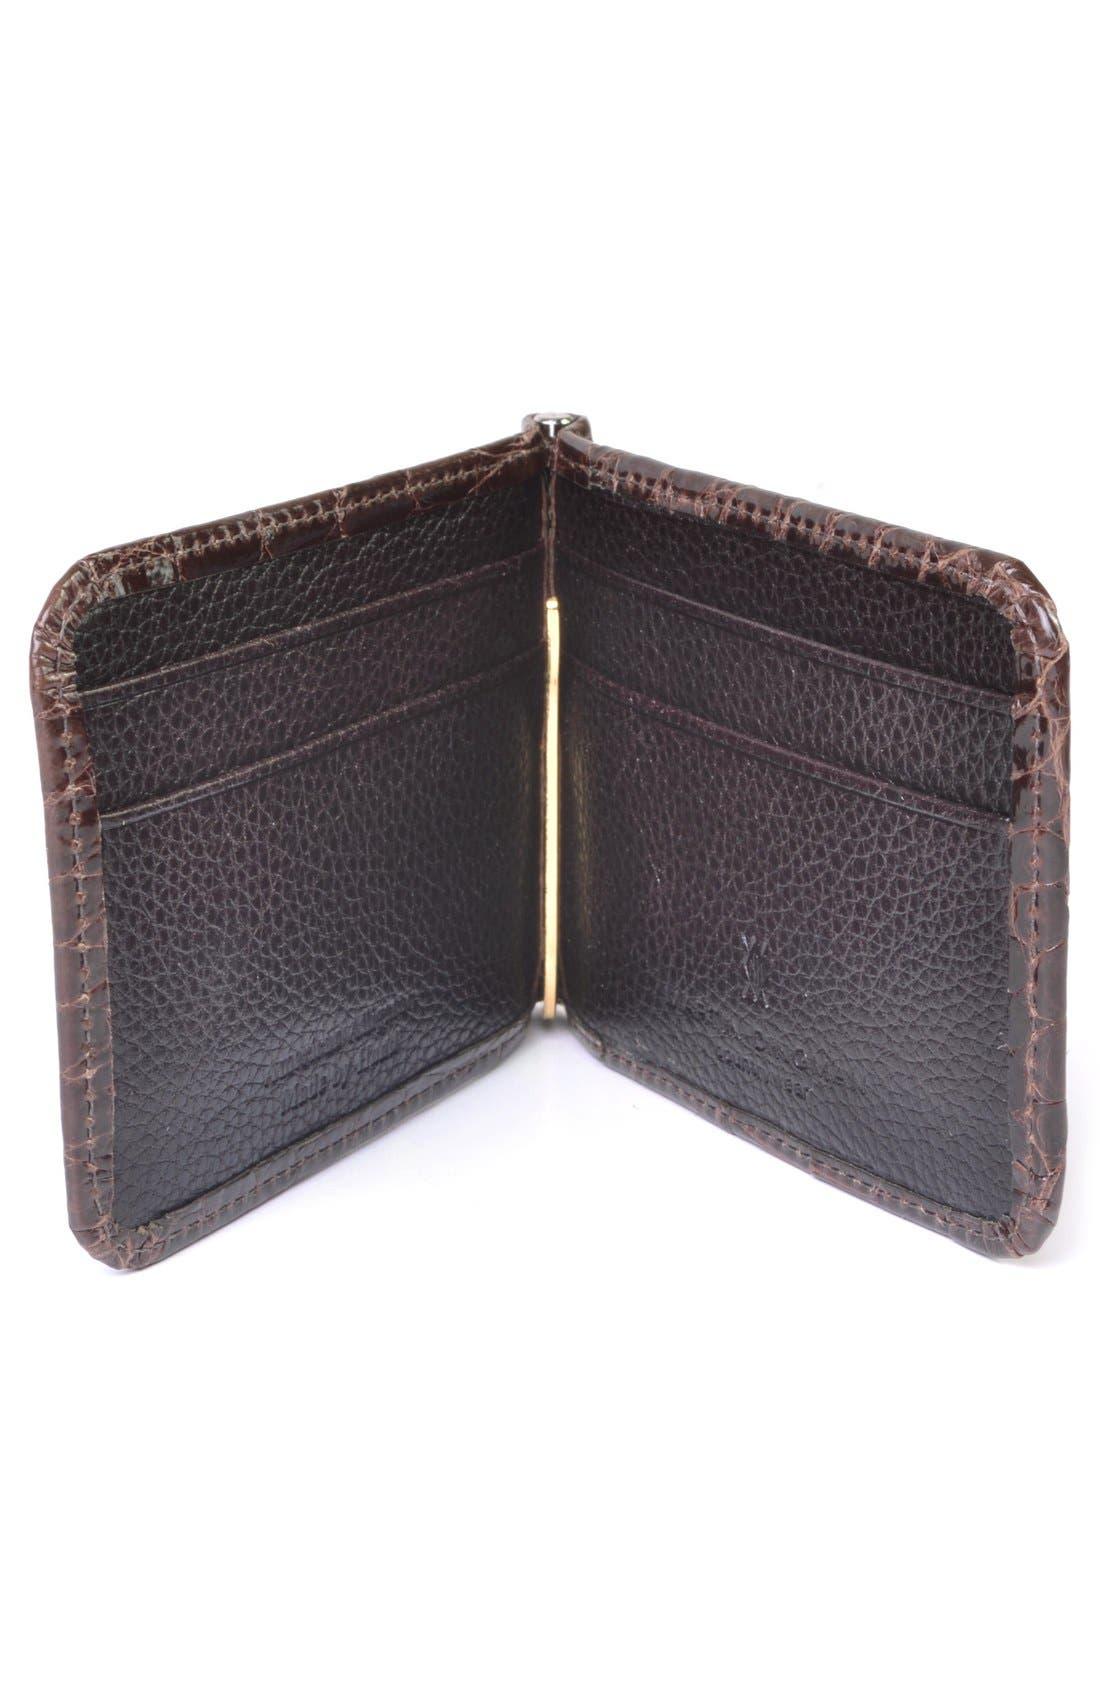 'Joseph' Genuine American Alligator Leather Money Clip Wallet,                             Alternate thumbnail 2, color,                             215